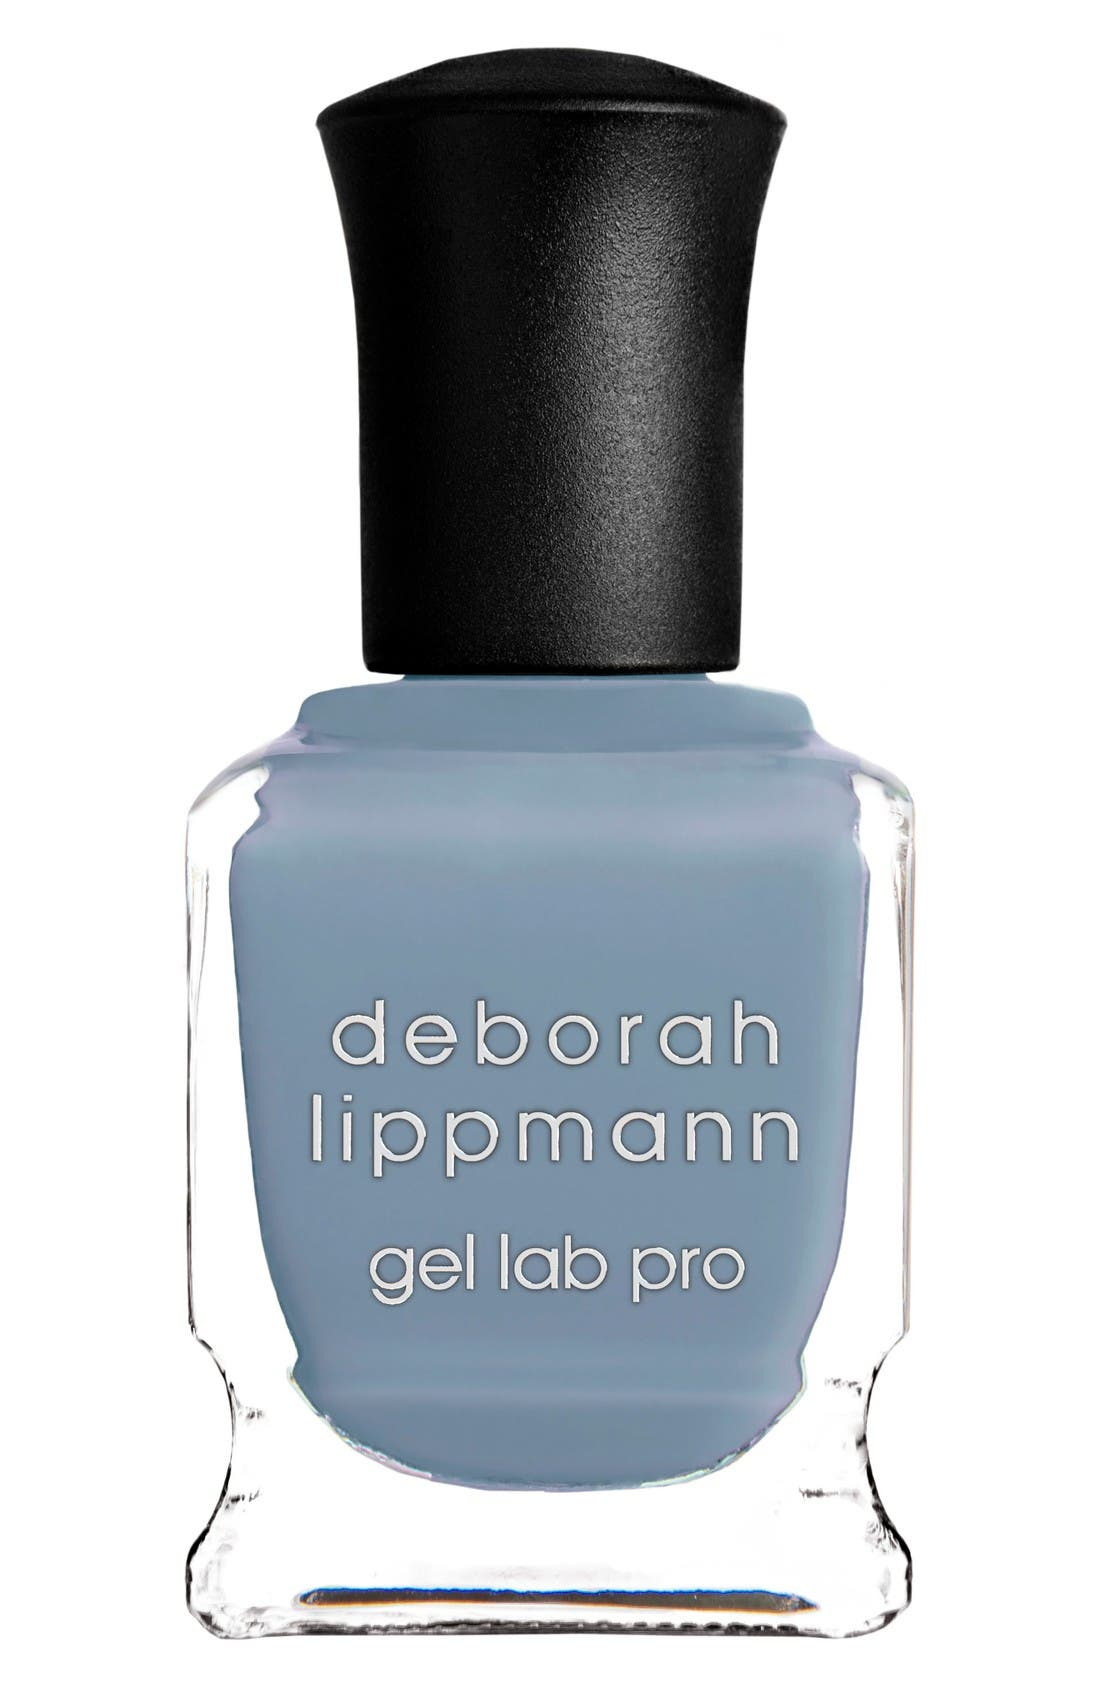 Deborah Lippmann Message in a Bottle Gel Lab Pro Nail Color